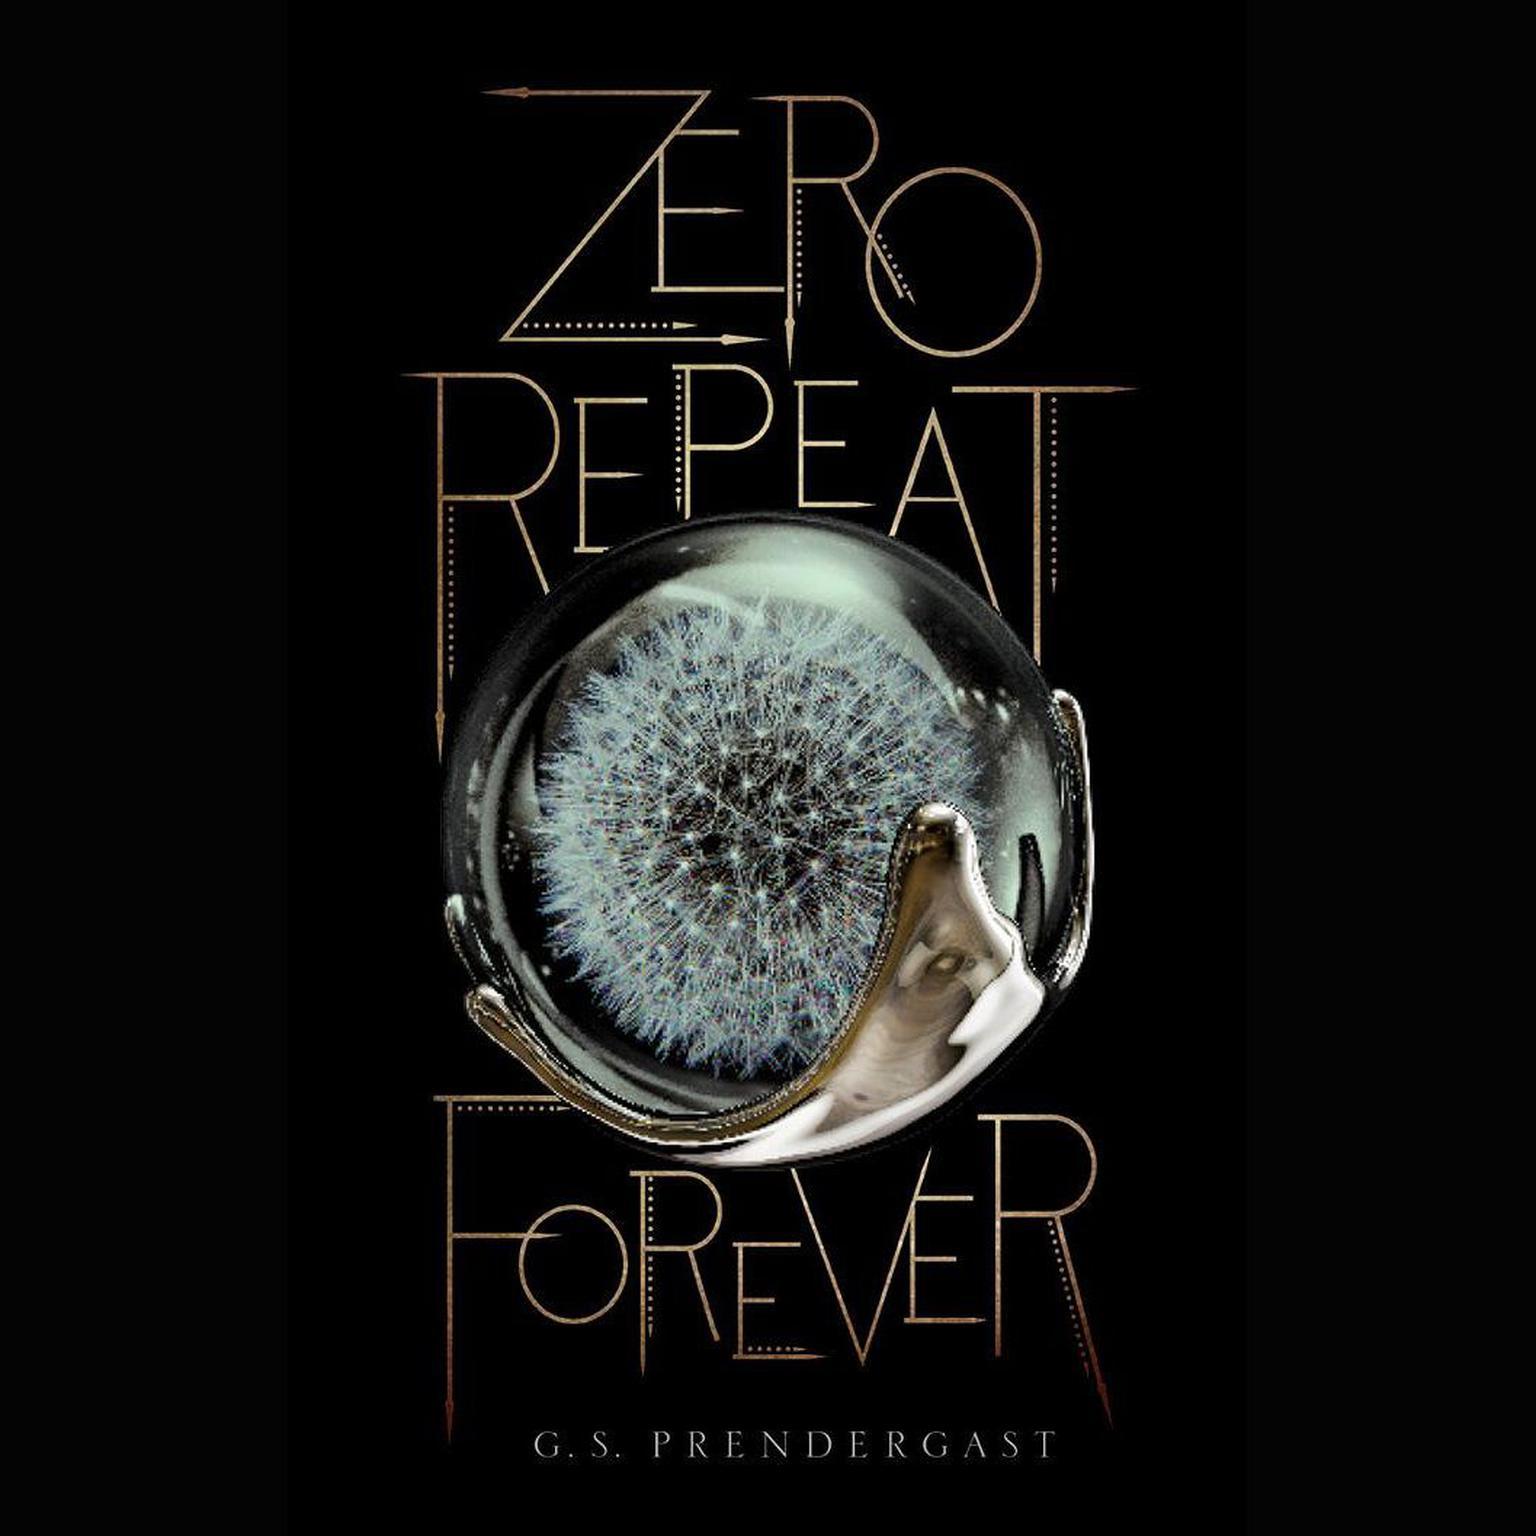 Printable Zero Repeat Forever Audiobook Cover Art